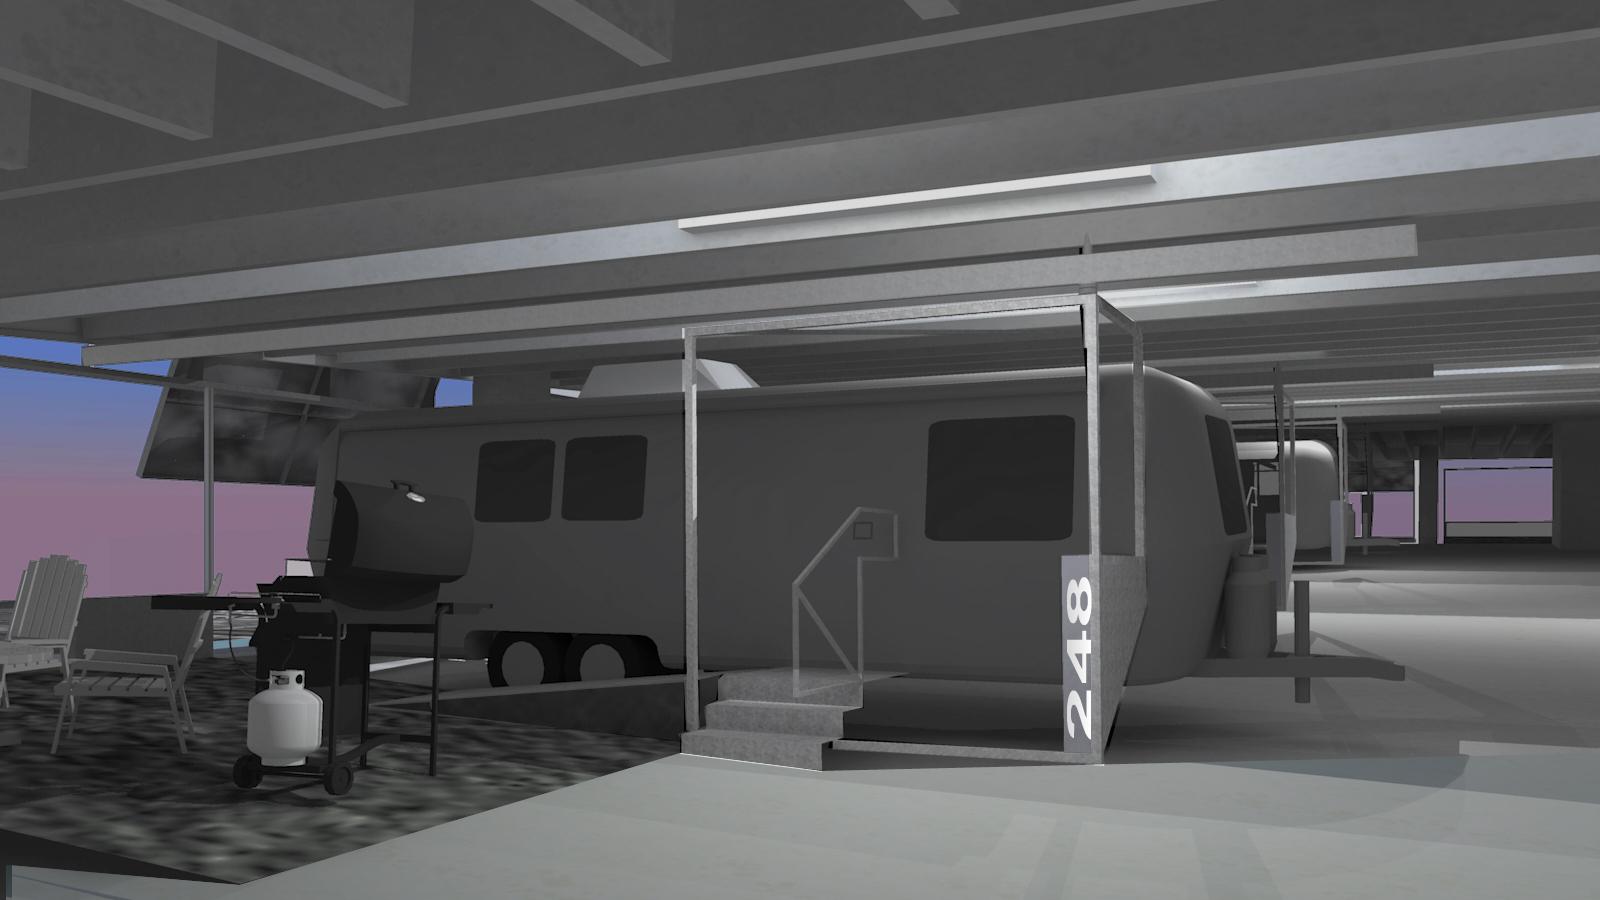 interior-01 copy.jpg